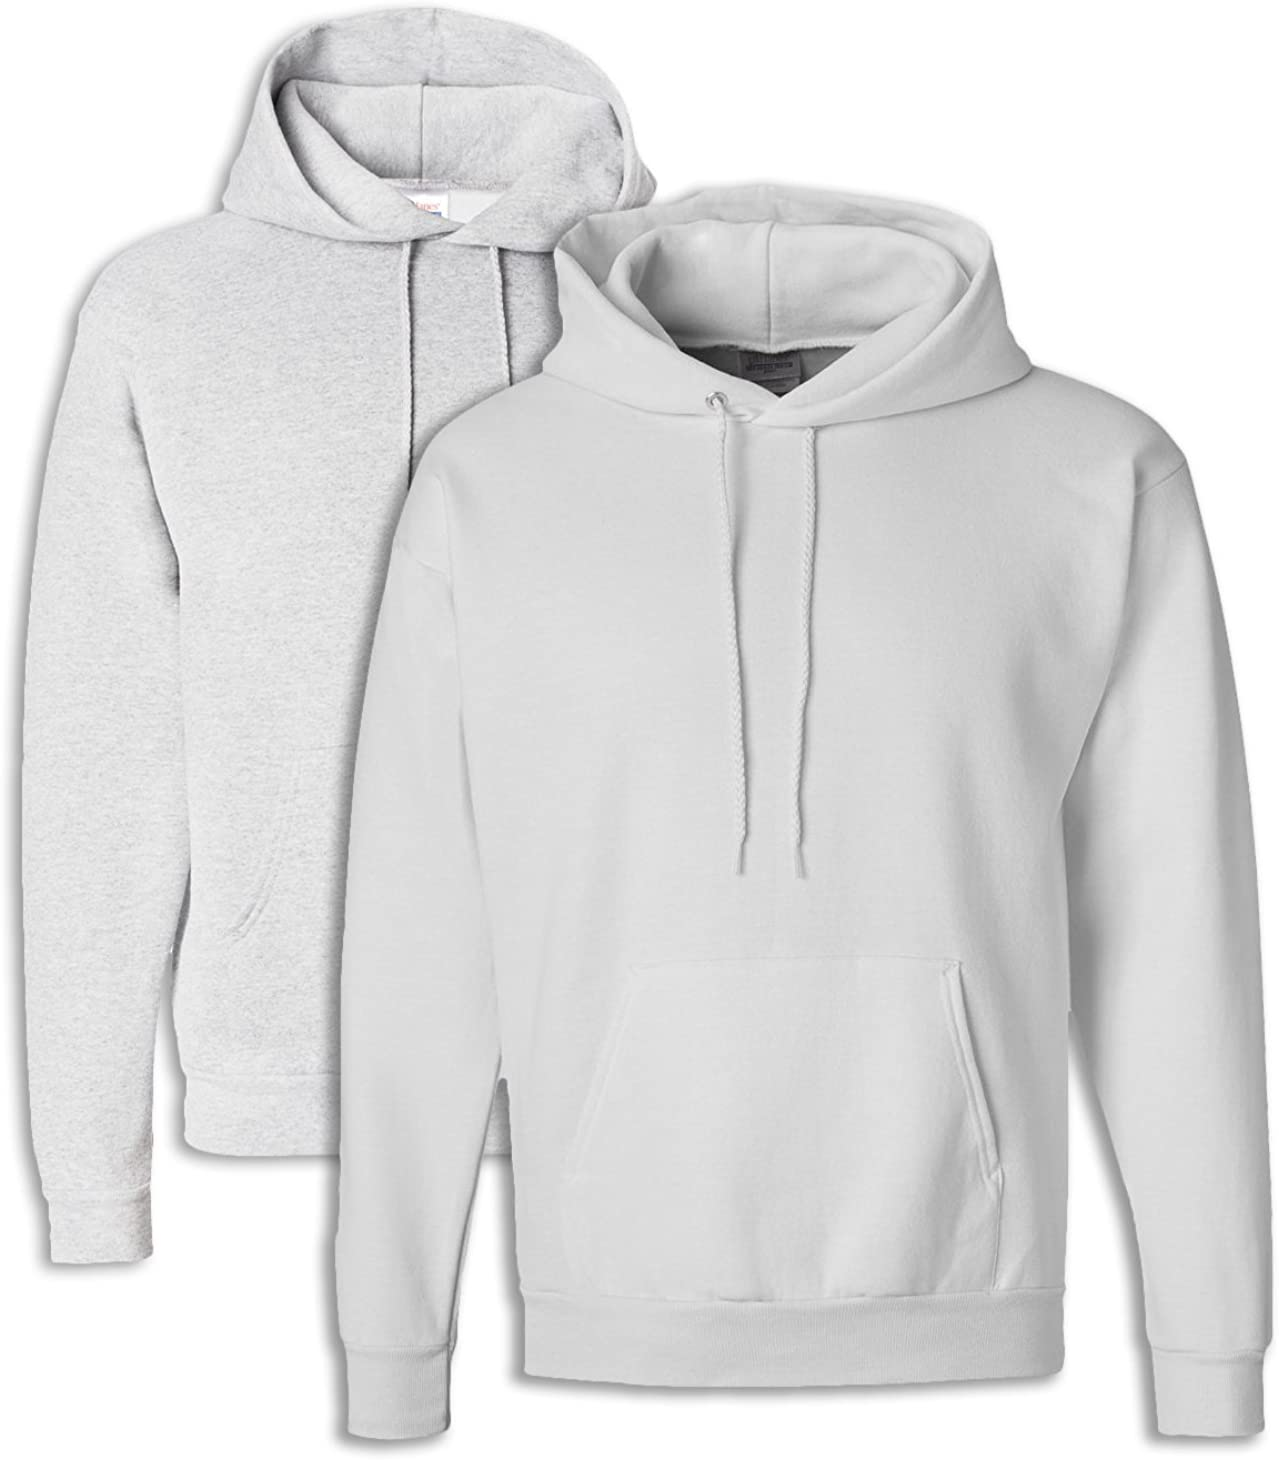 Hanes Mens EcoSmart Hooded Sweatshirt Large 1 Ash 1 White